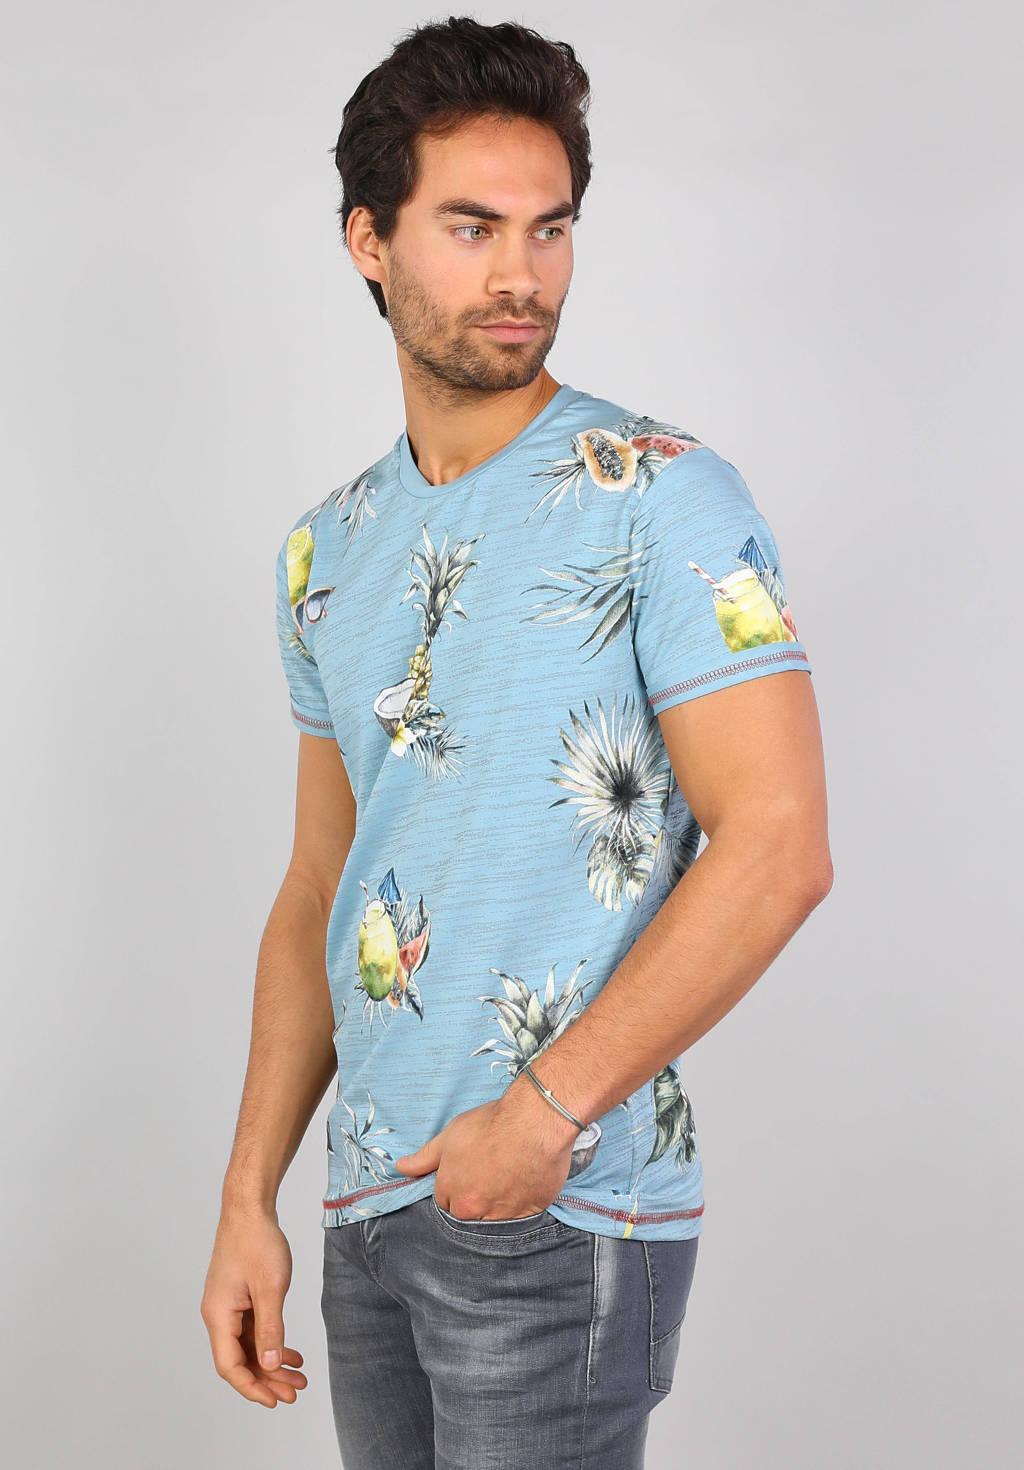 GABBIANO T-shirt met all over print lichtblauw, Lichtblauw